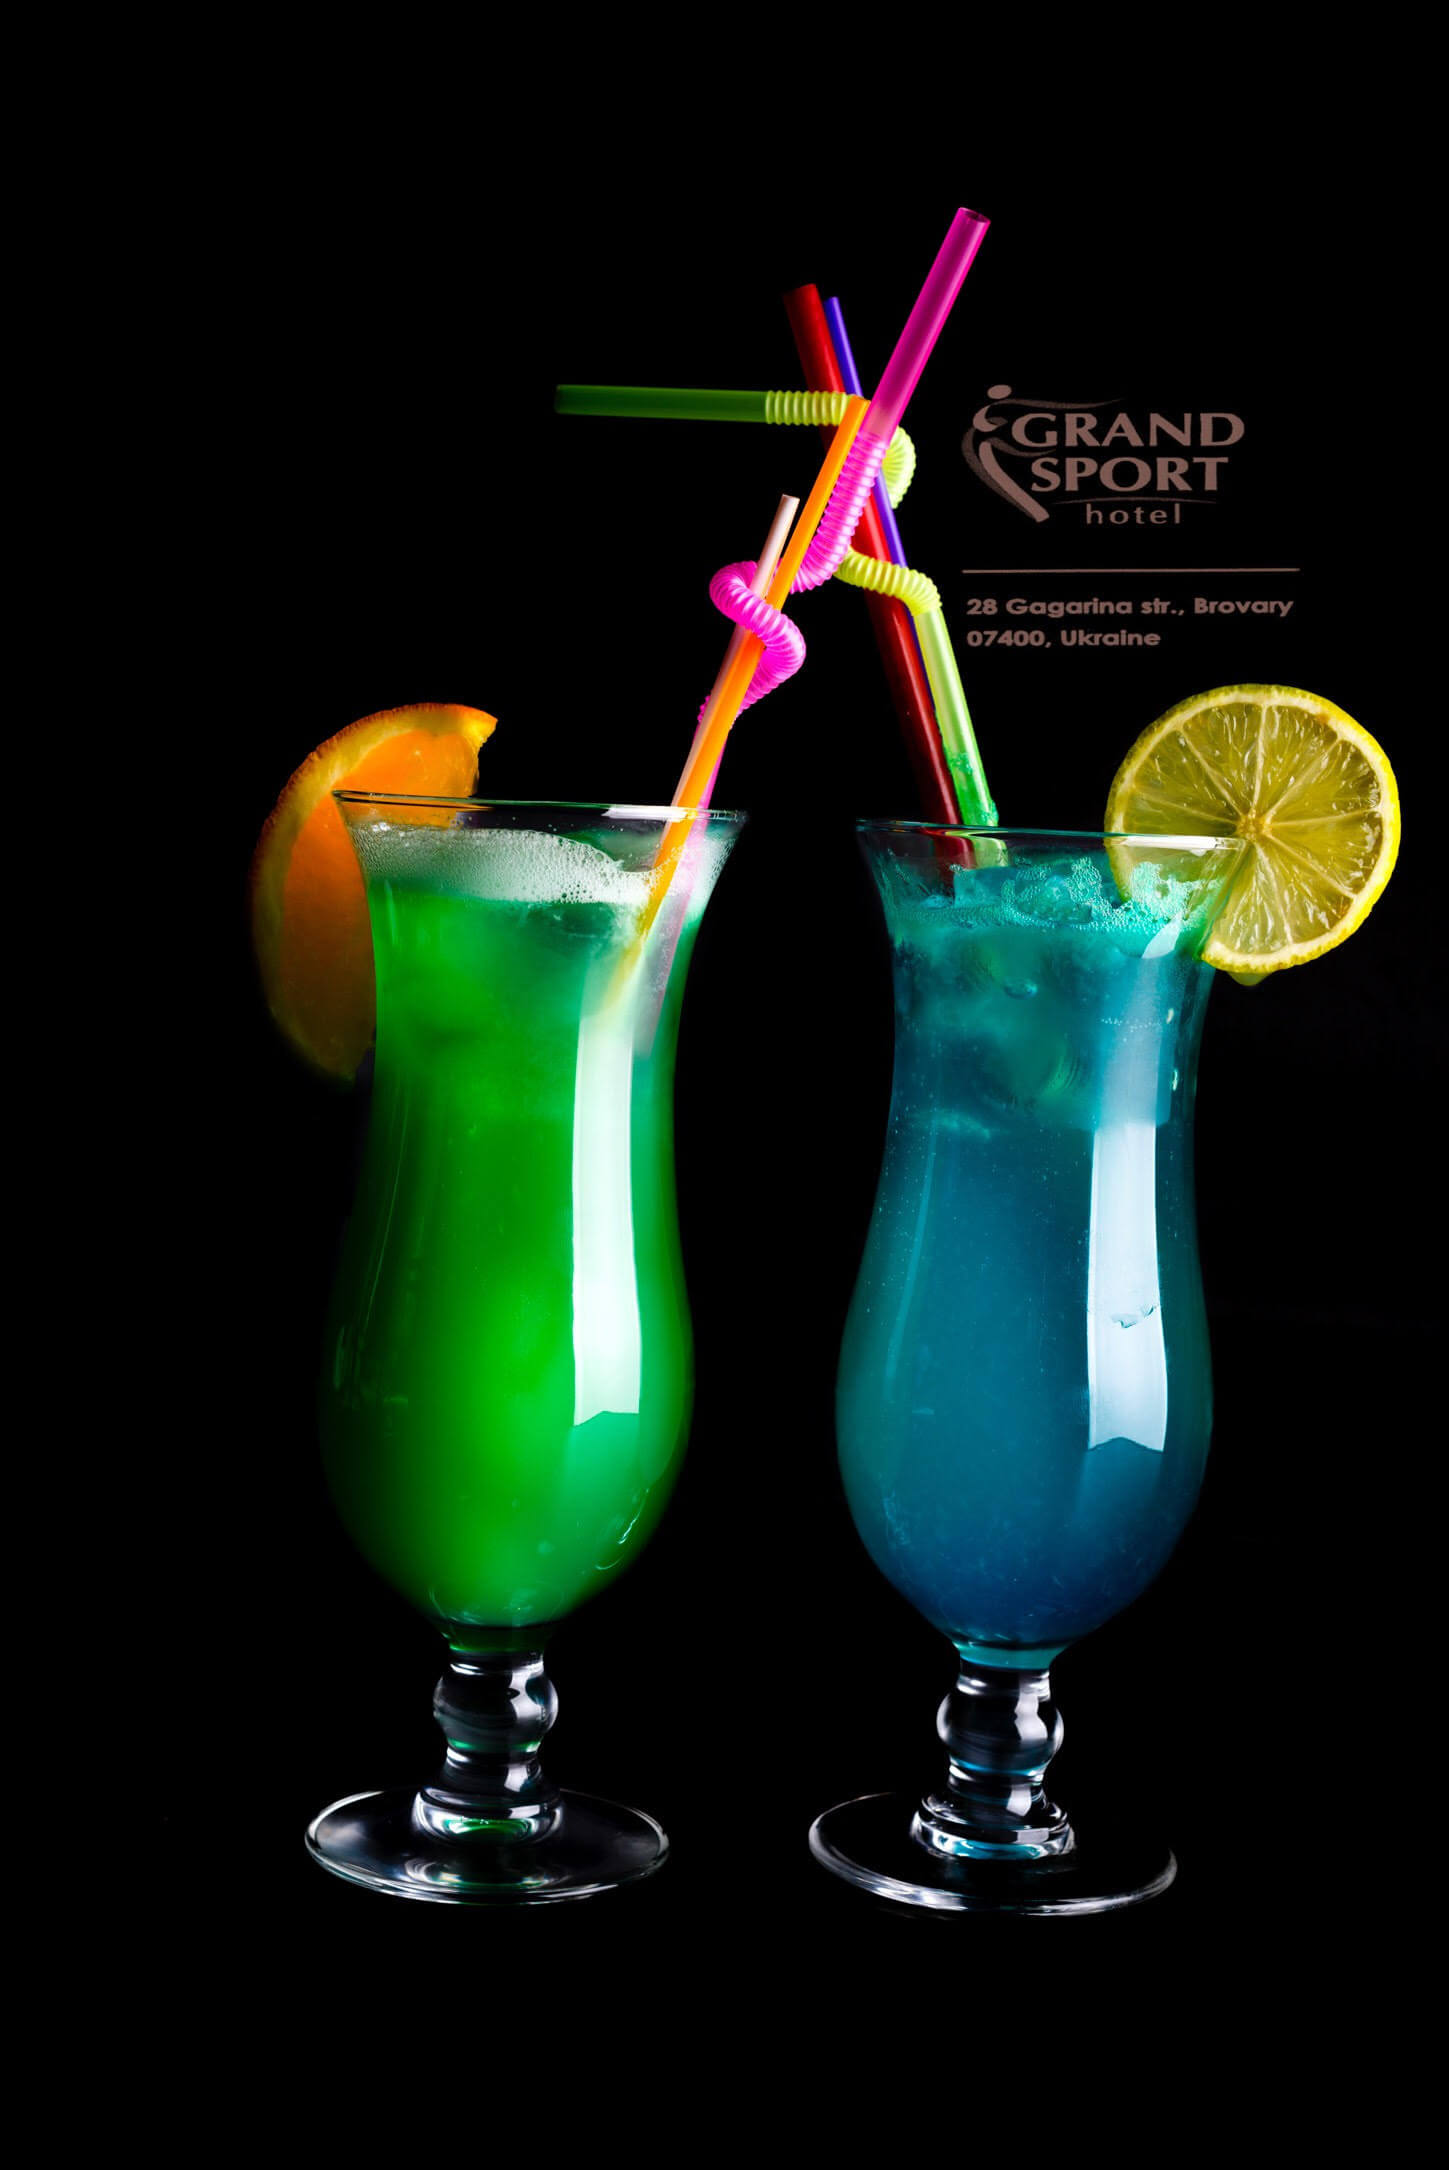 алкоголь Бровары